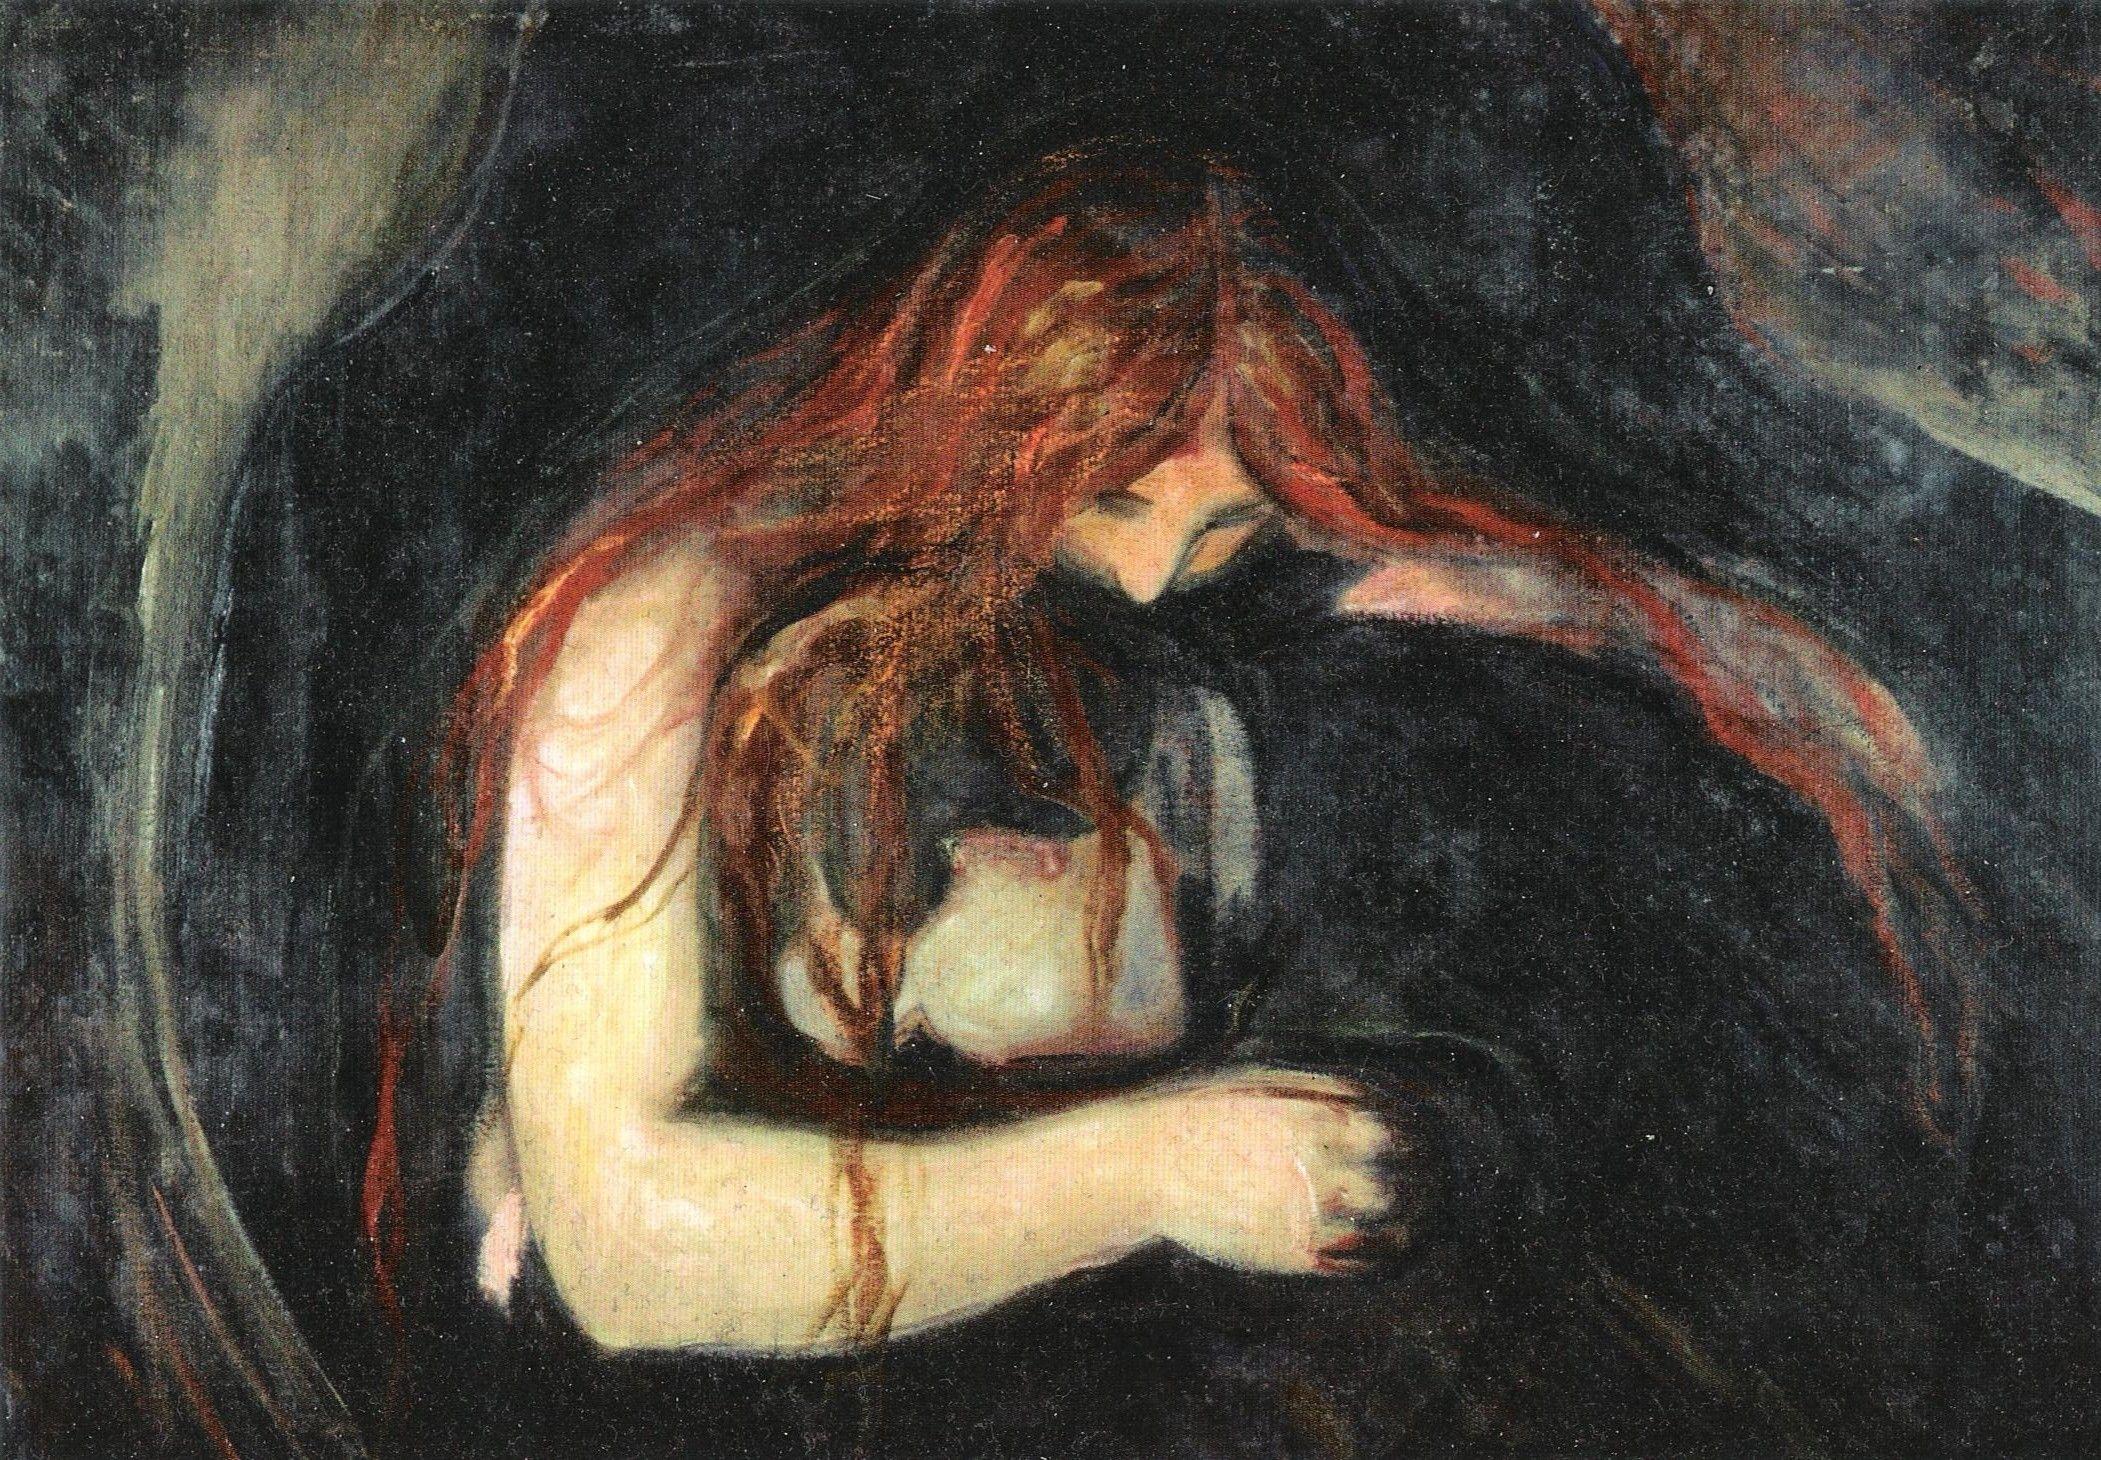 Edvard Munch/Expressionisim 19th Century Vampire